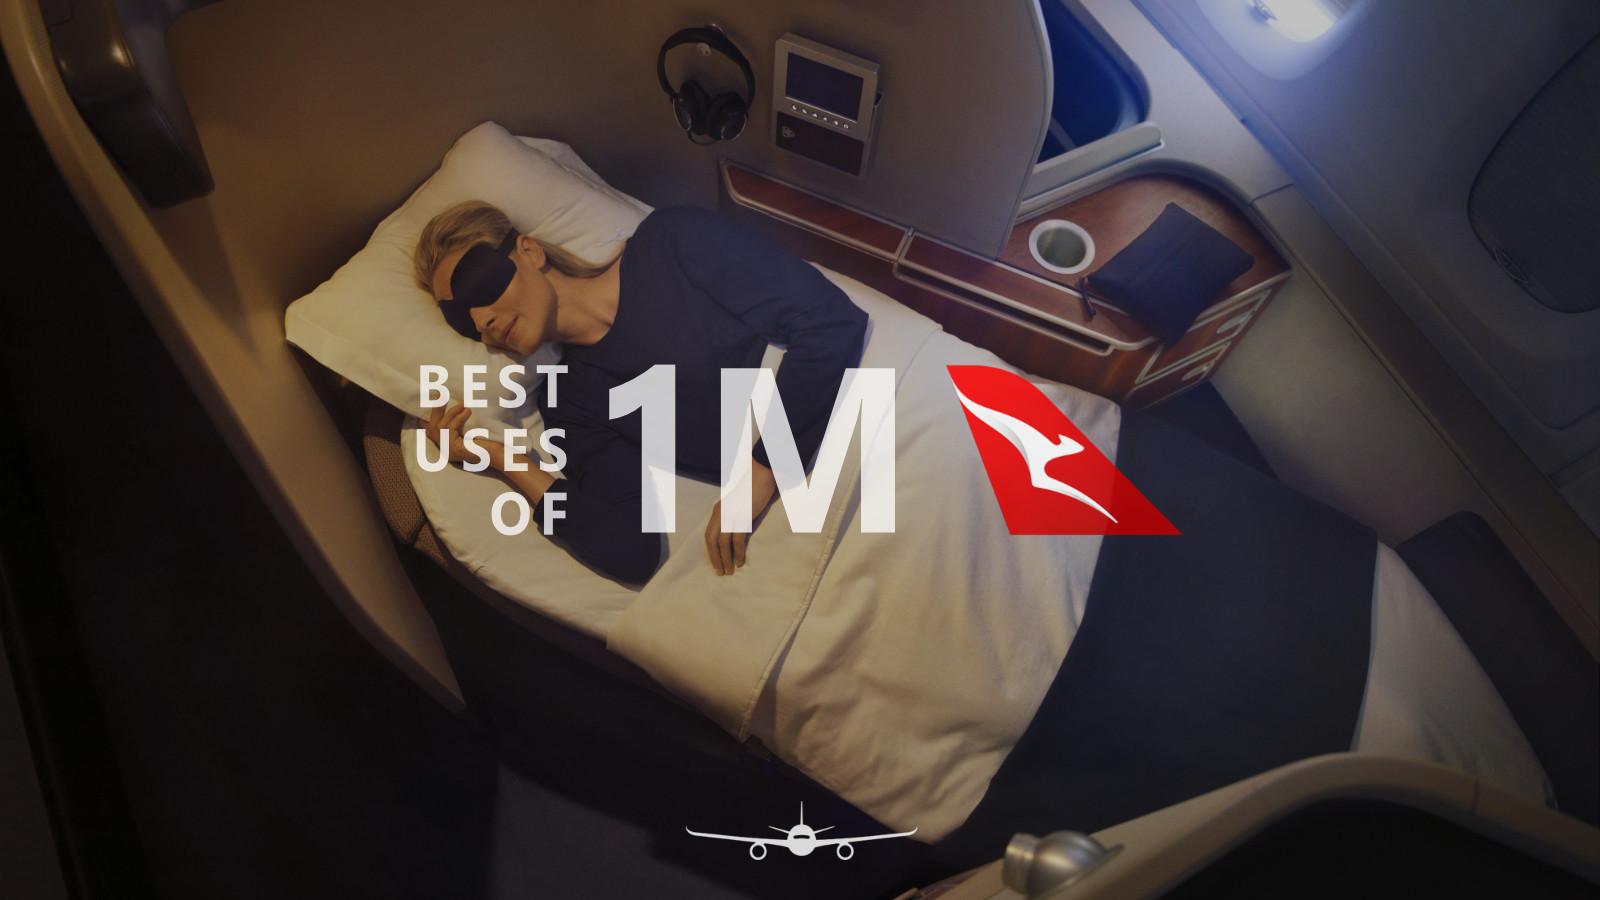 Best uses of 1 million Qantas Points